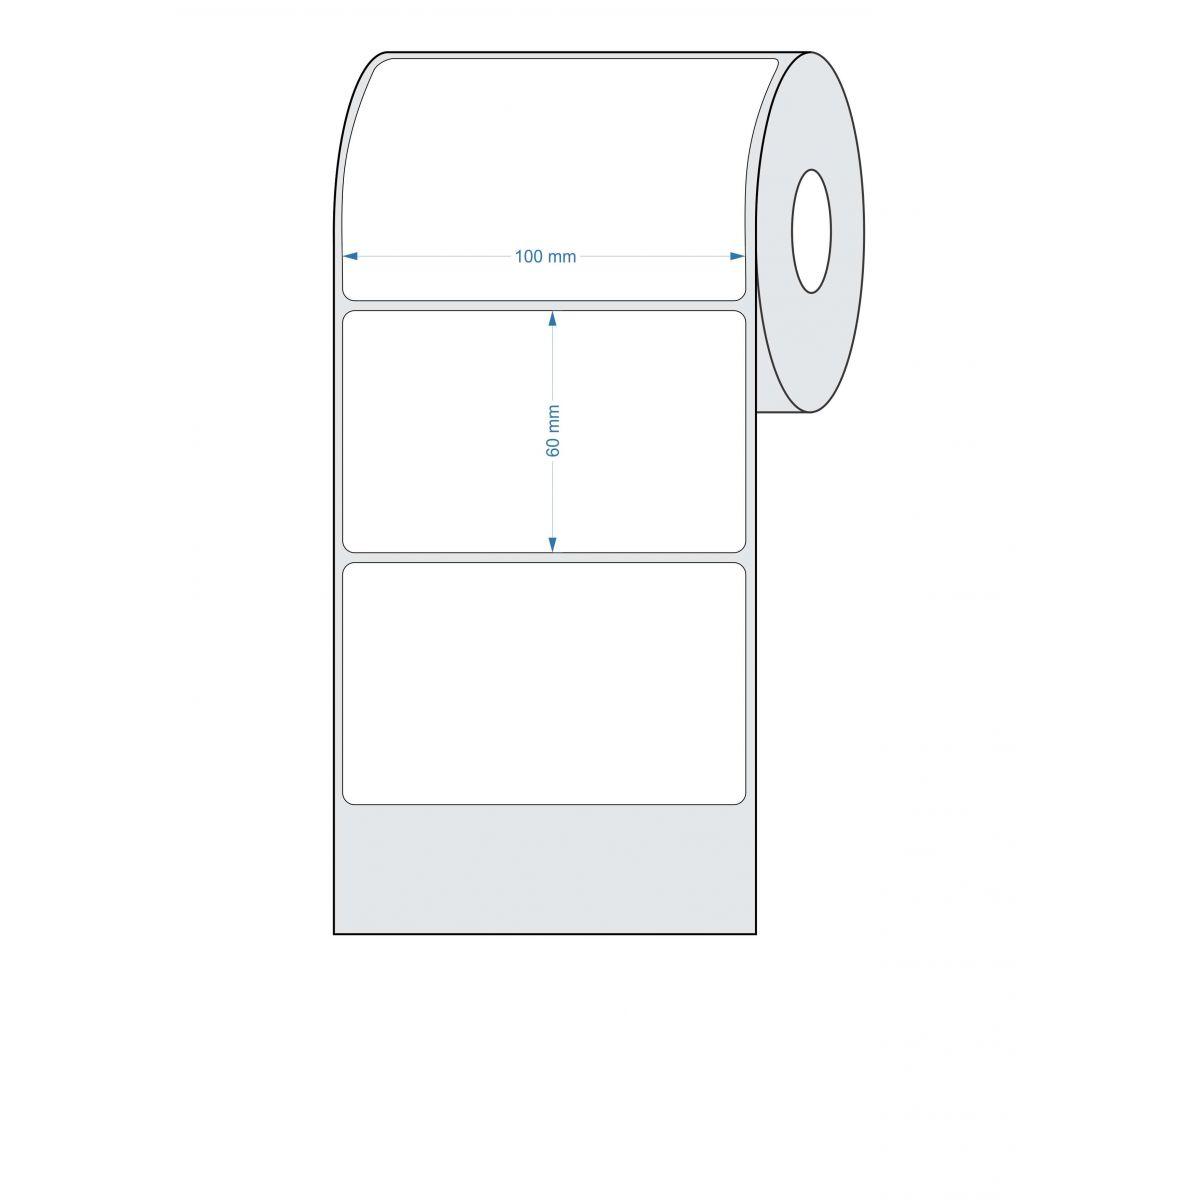 Etiquetas Adesivas 100x60 mm Térmica 32 Metros